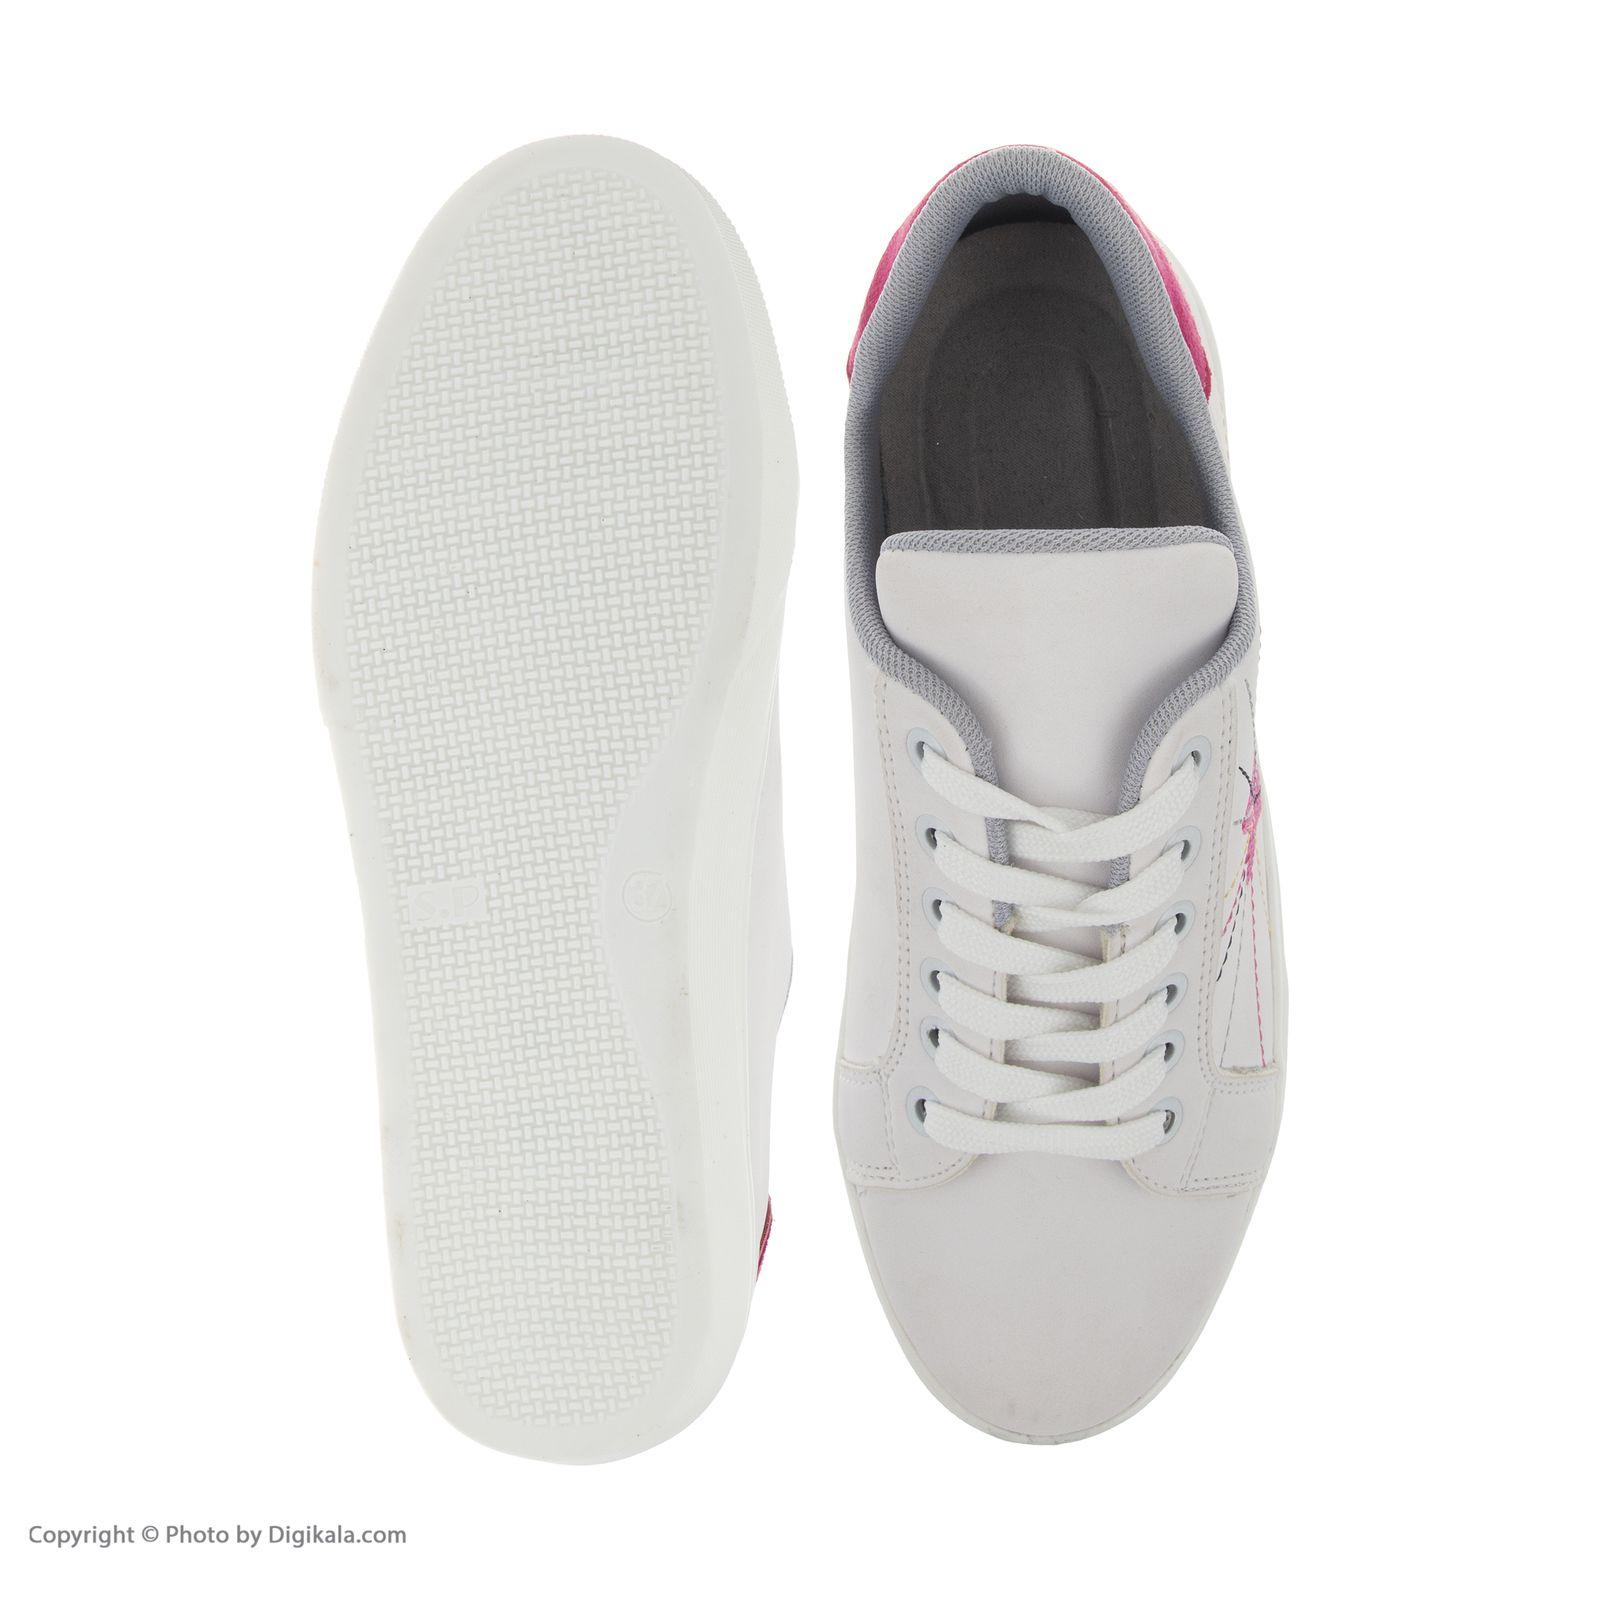 کفش روزمره زنانه مدل 4022 -  - 6